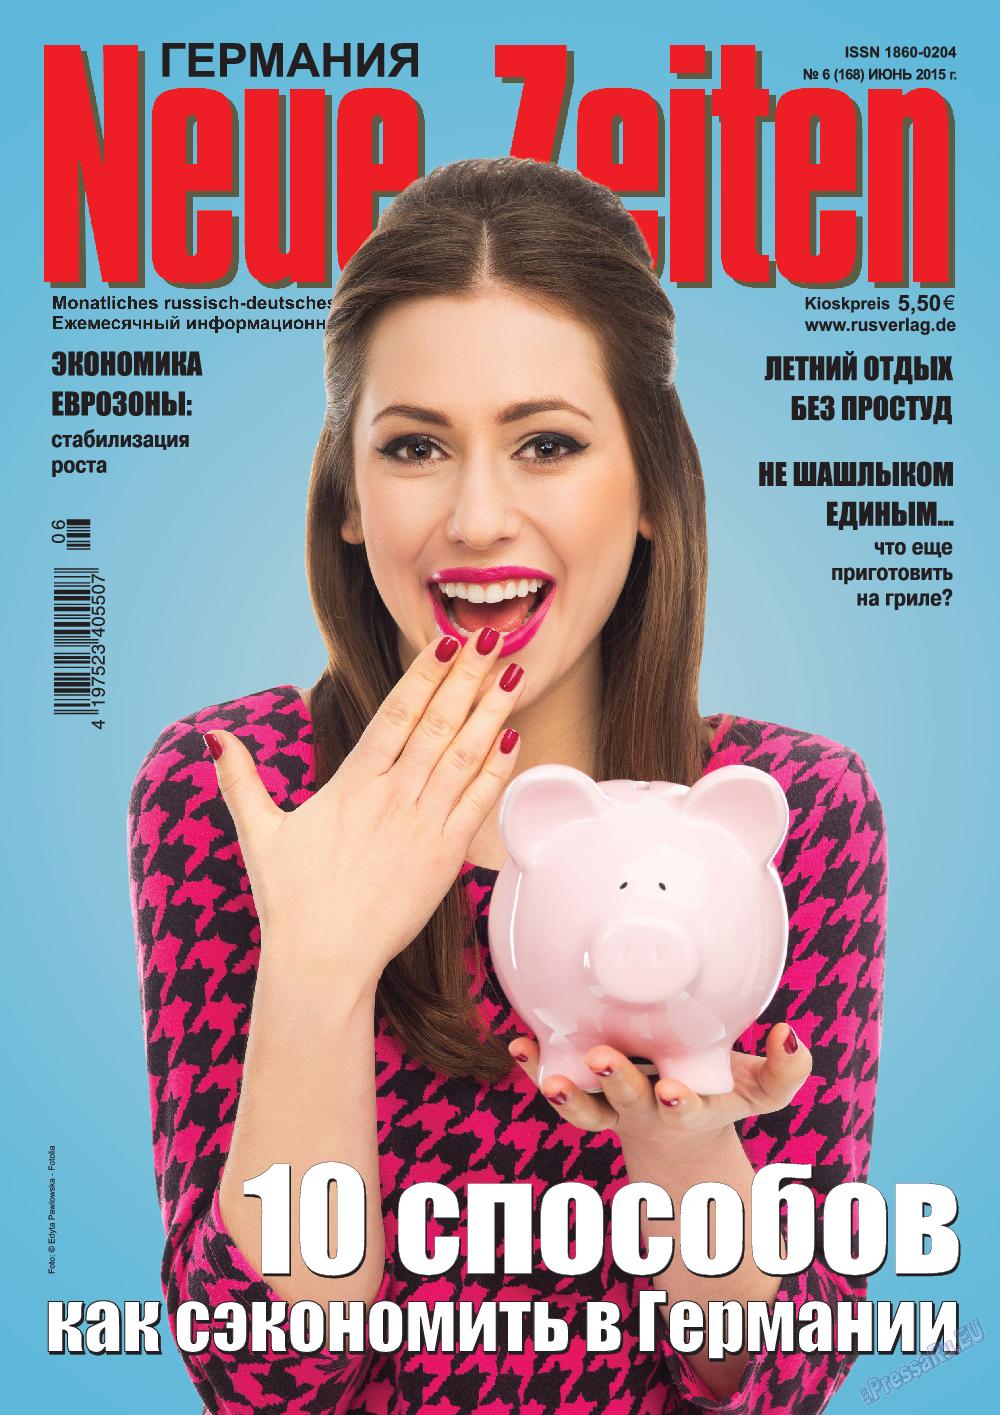 Neue Zeiten (журнал). 2015 год, номер 6, стр. 1